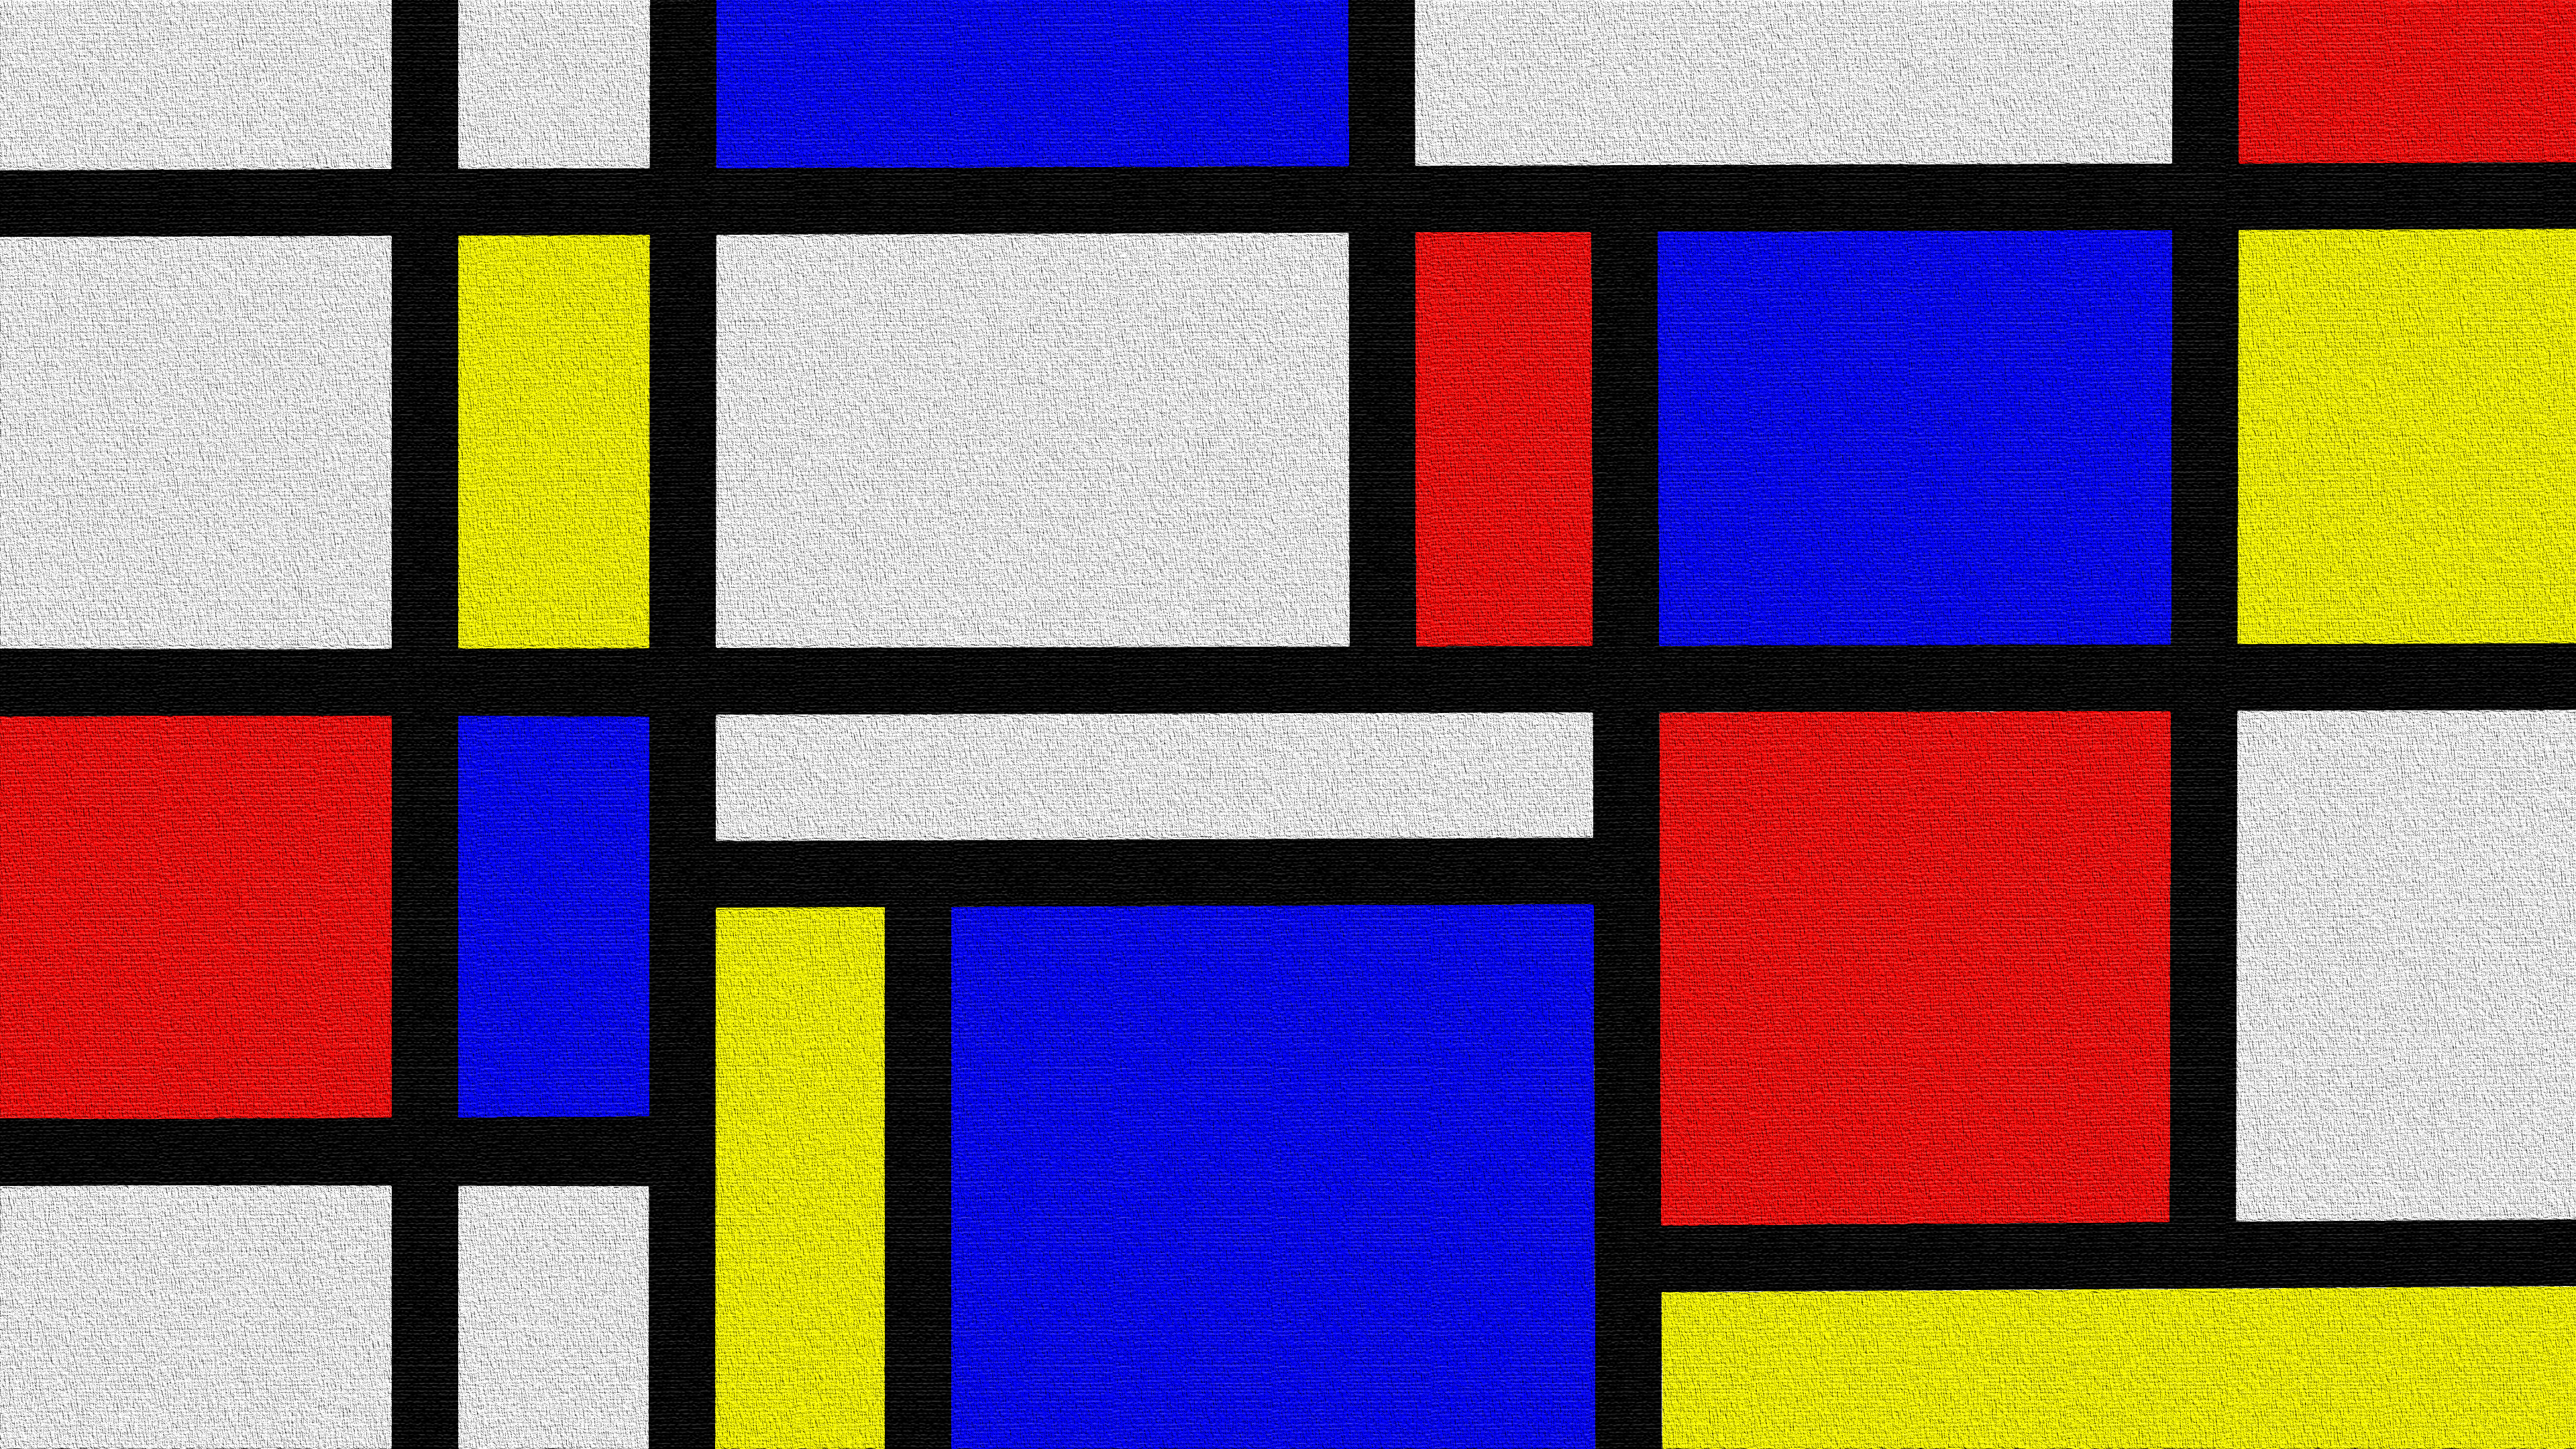 Mondrian Style   Oil on Canvas 4k Ultra HD Wallpaper Background 3840x2160